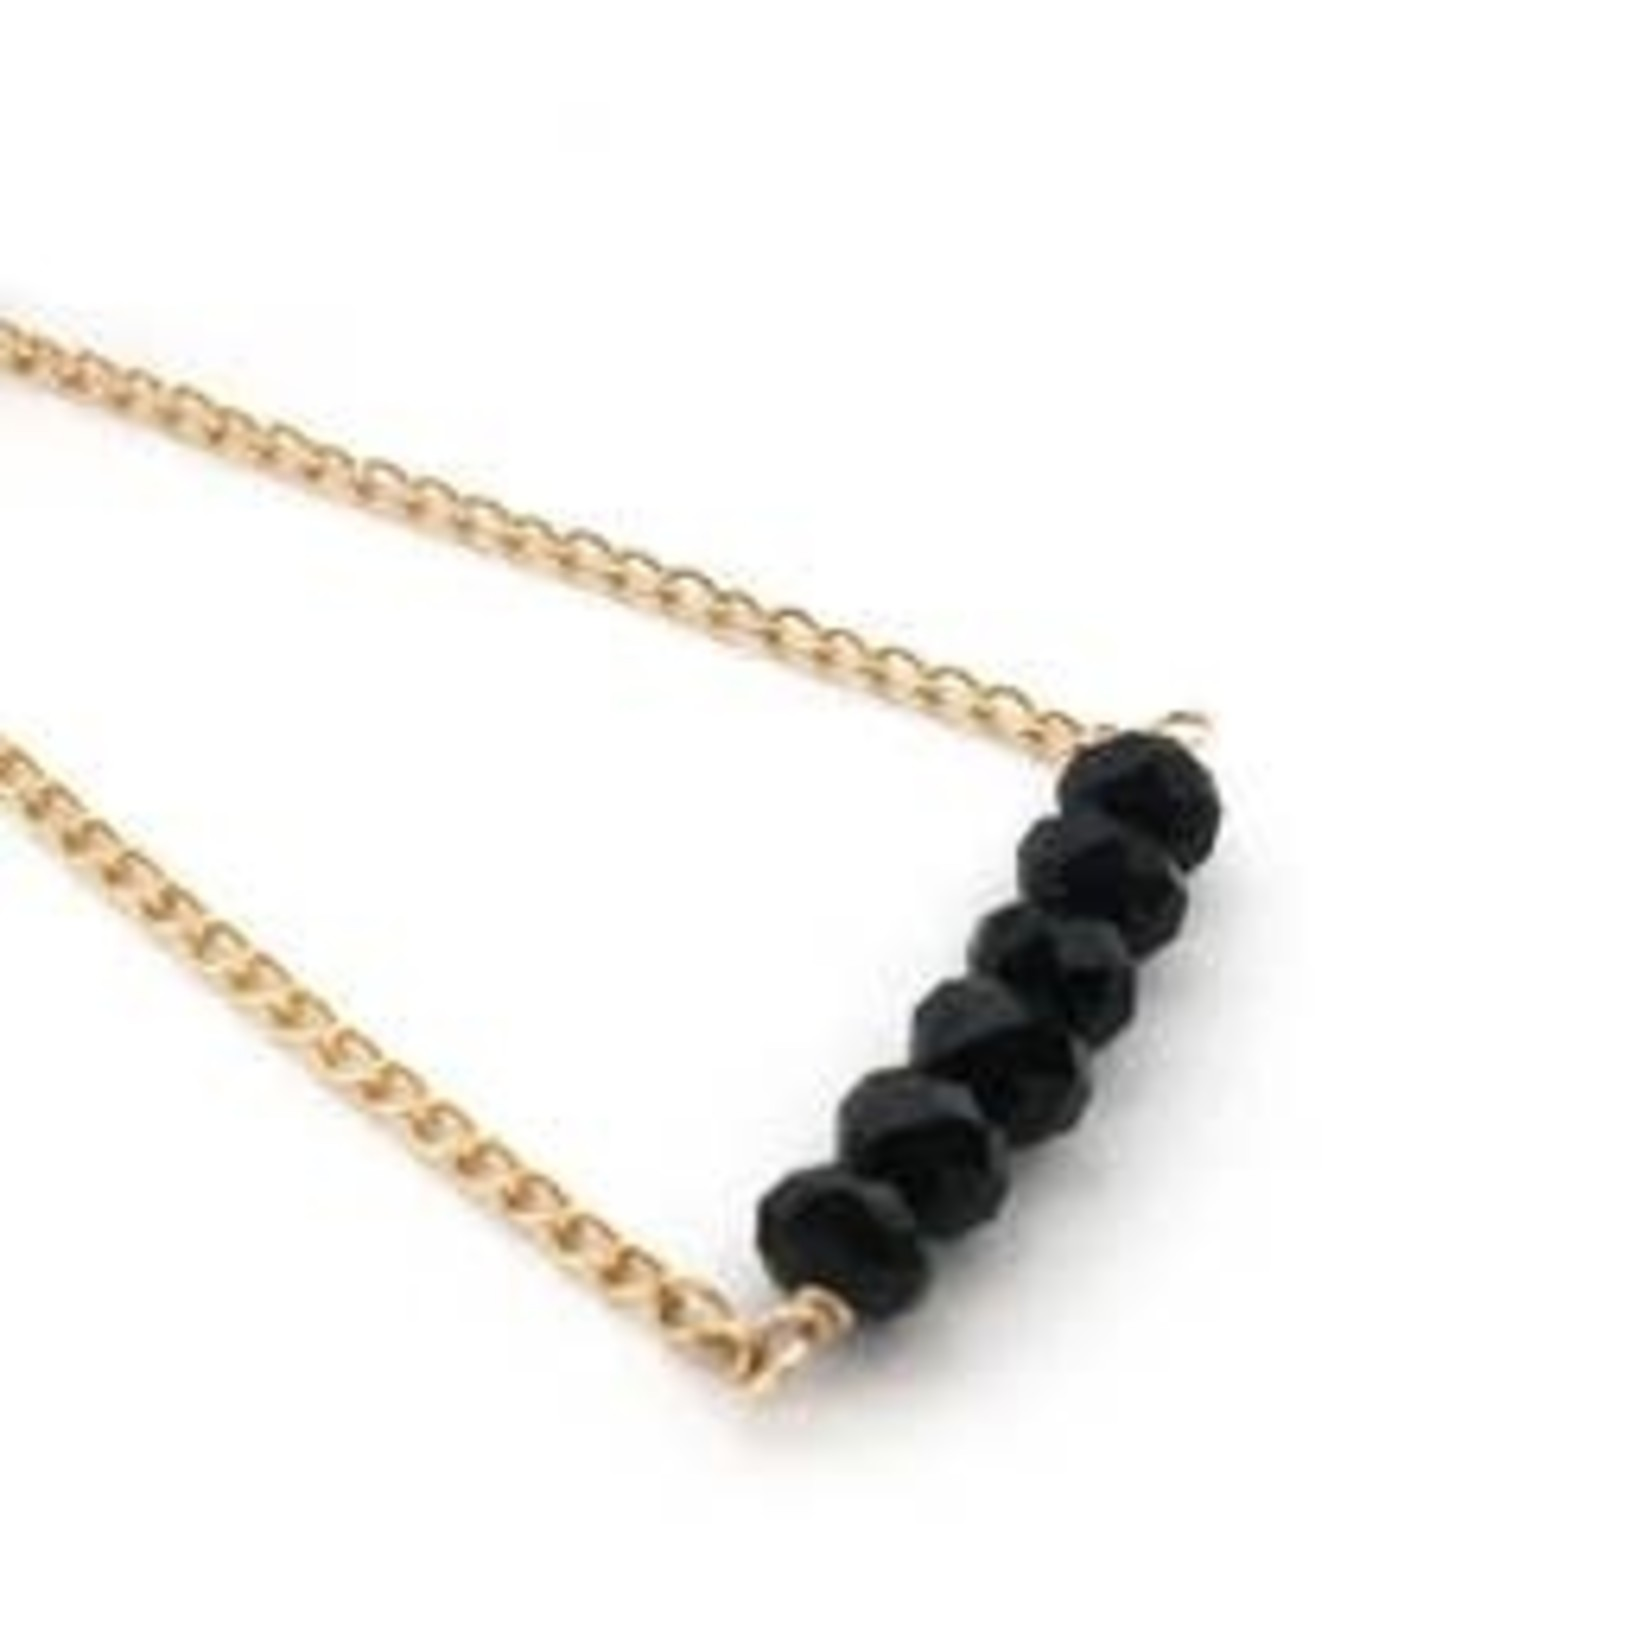 Mana Made Jewelry Mana Made Black Onyx Bar Necklace Gold Fill Chain